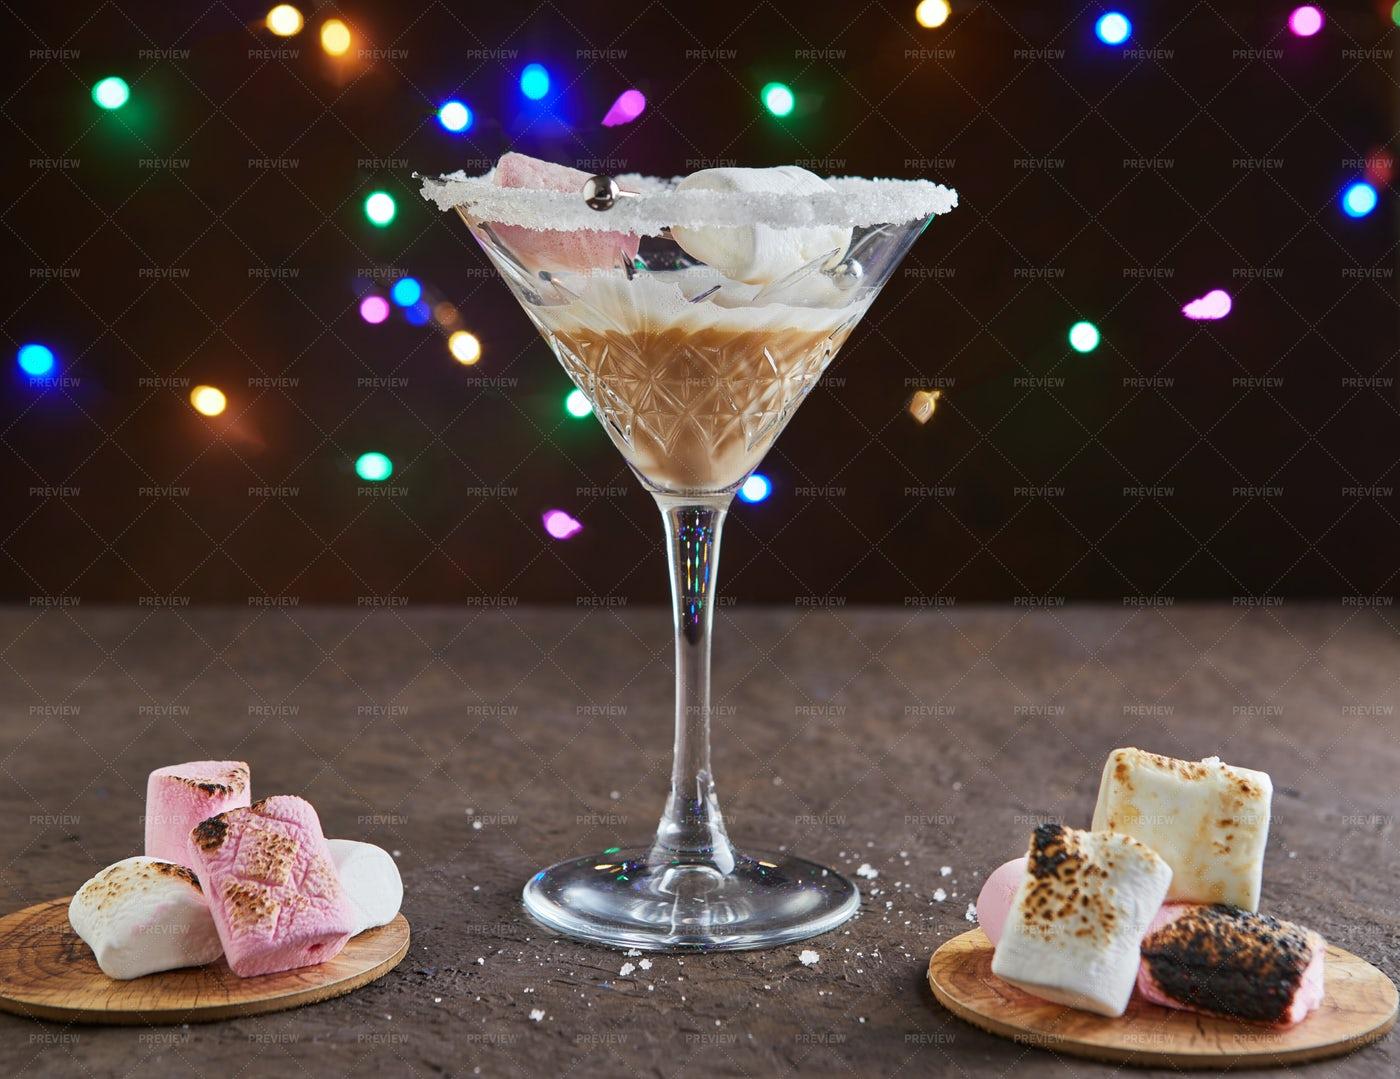 Irish Cream Liqueur With Marshmallows: Stock Photos